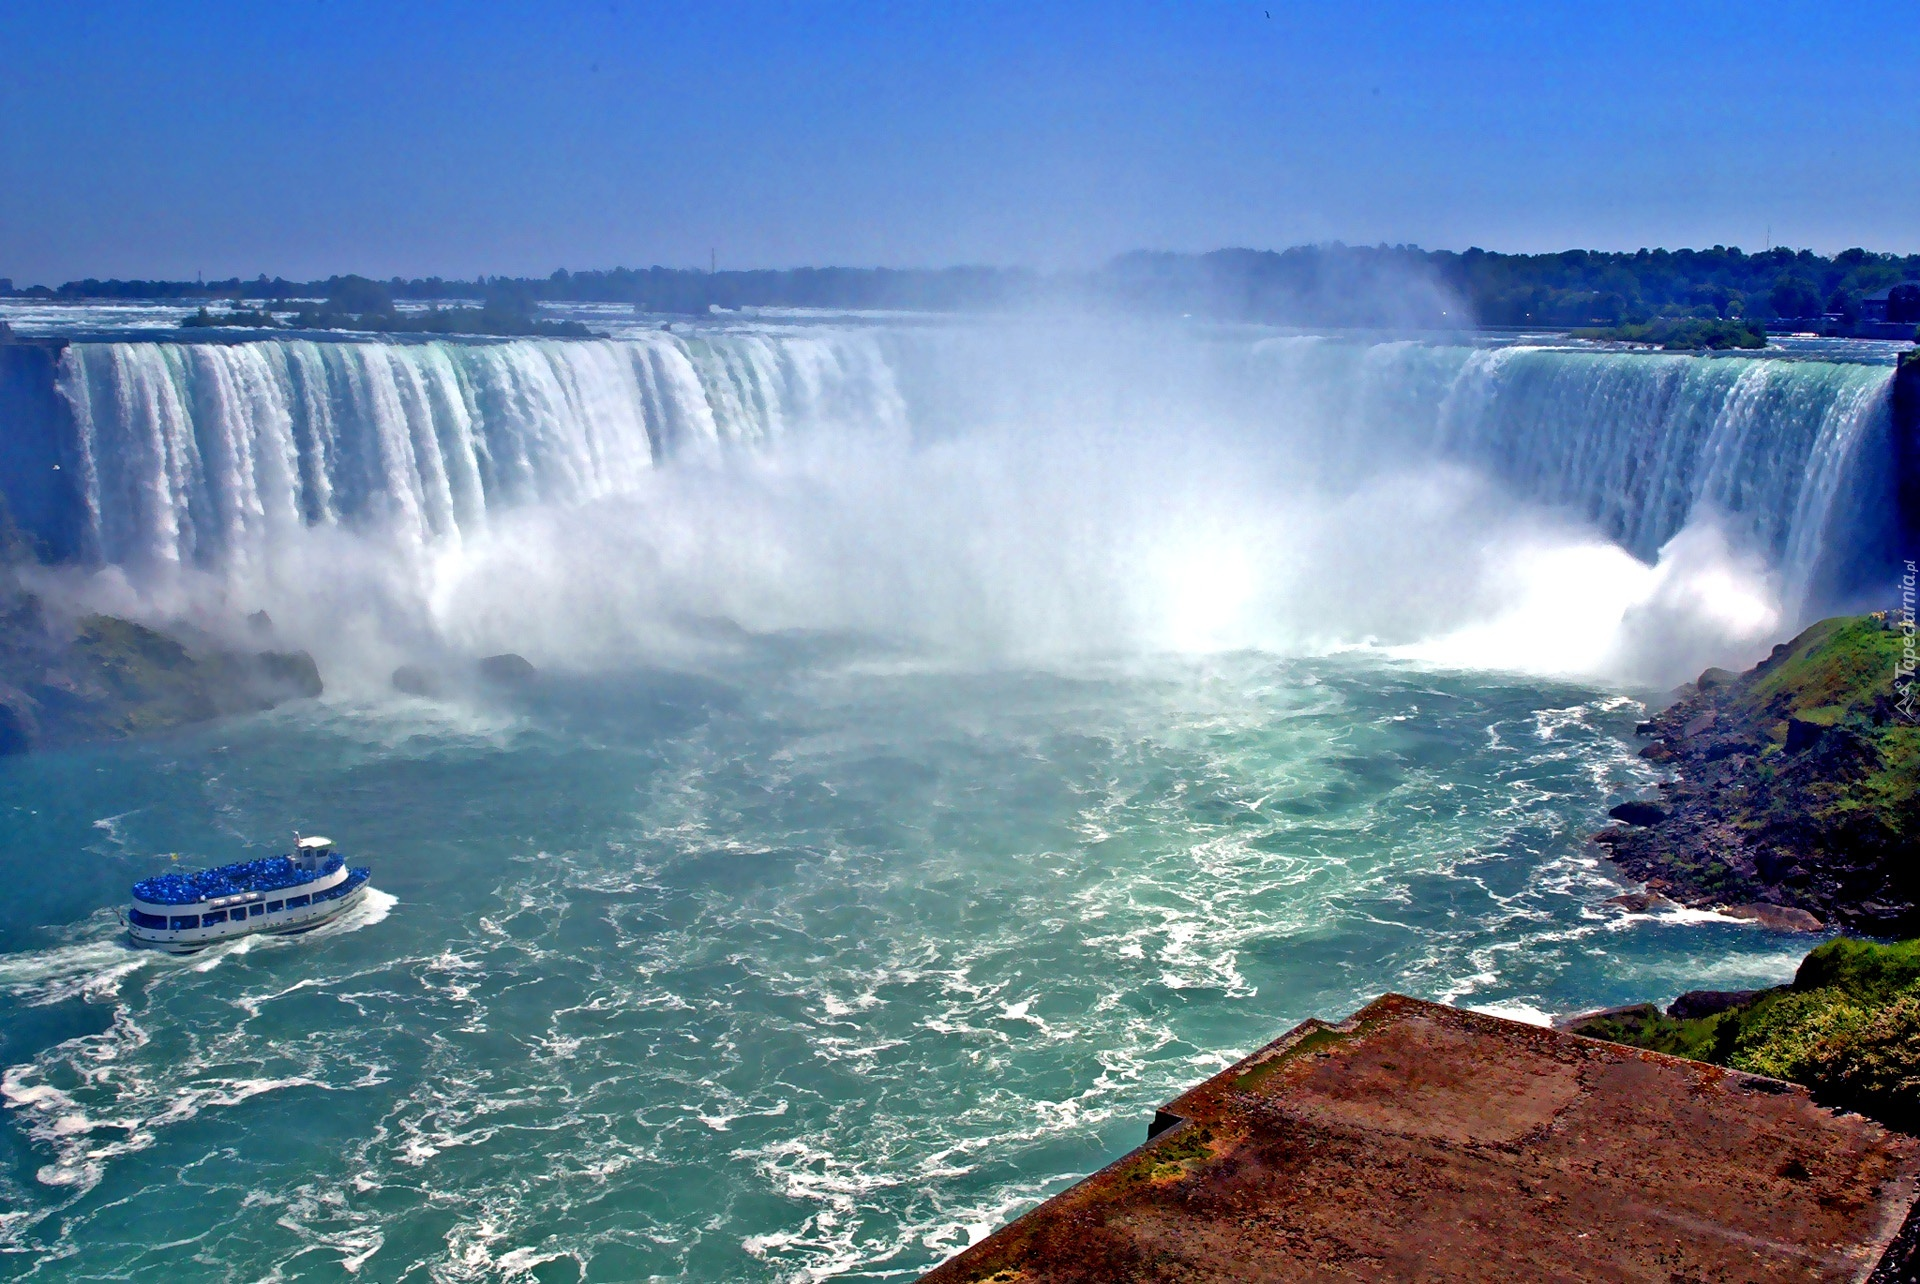 Niagara Falls At Night Wallpaper Wodospad Niagara Wycieczki Wzburzona Woda